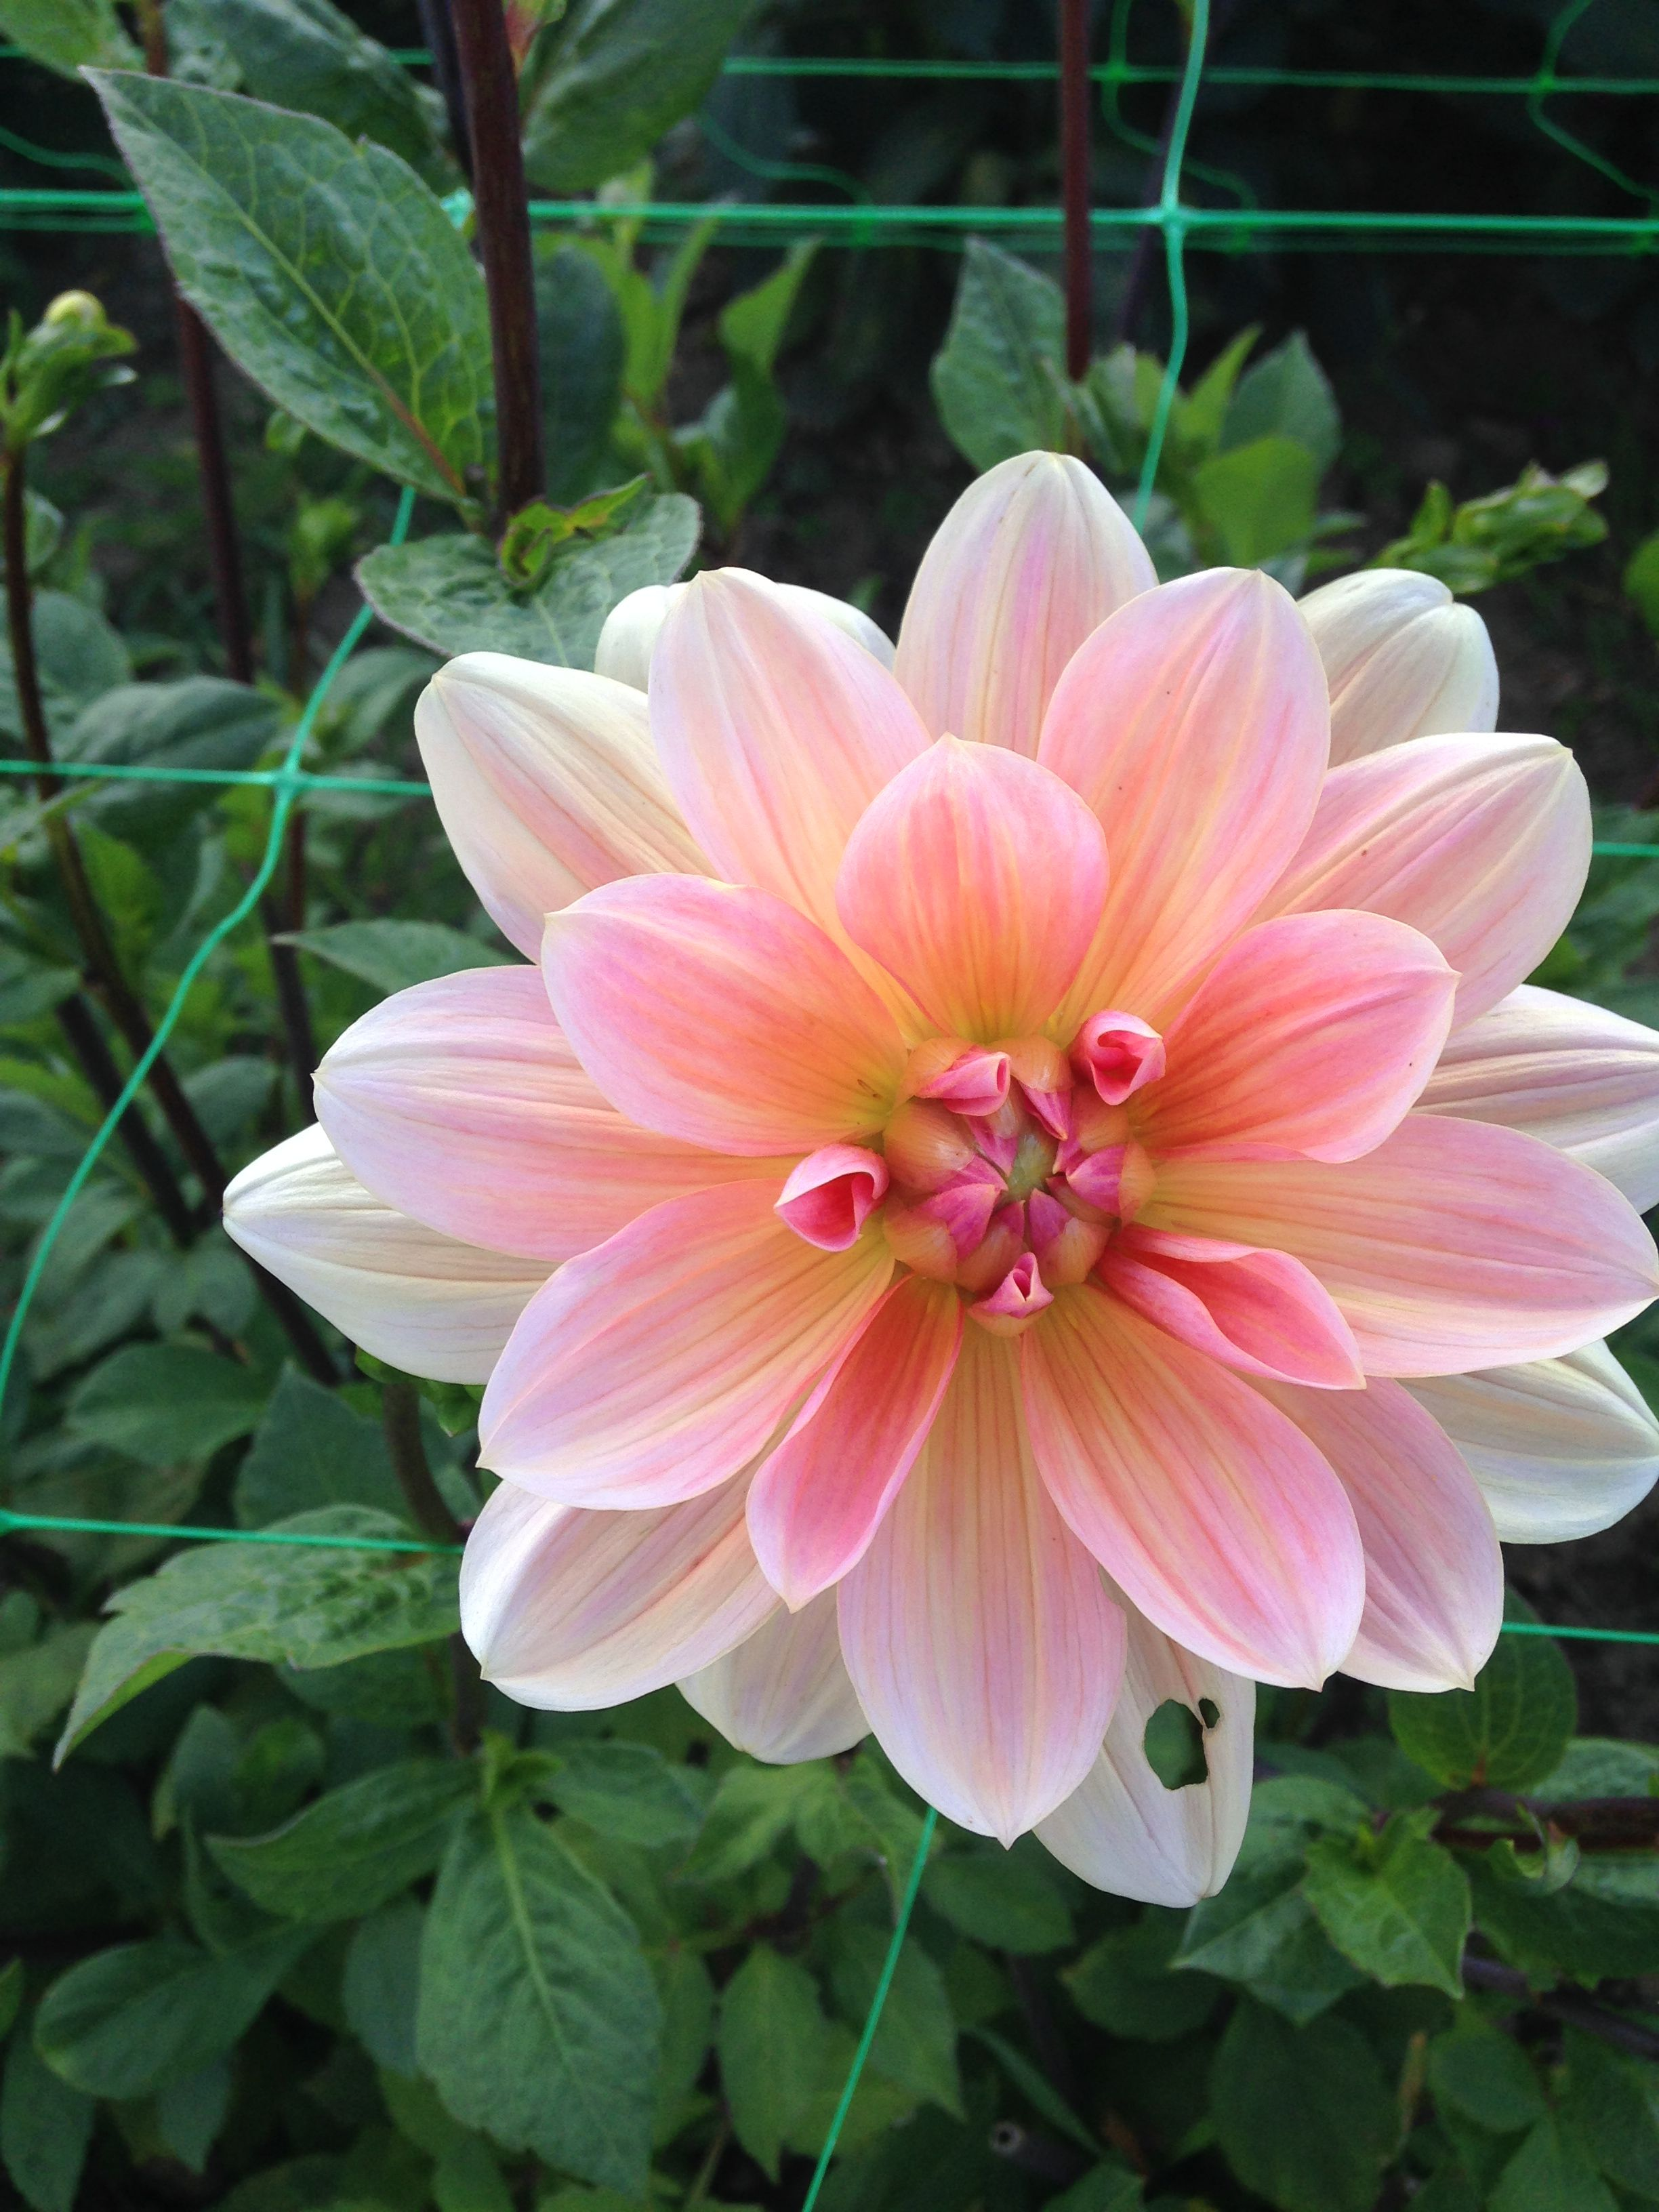 Dahlia Yvonne Dahlia Varieties Pinterest Dahlia And Flower Boxes